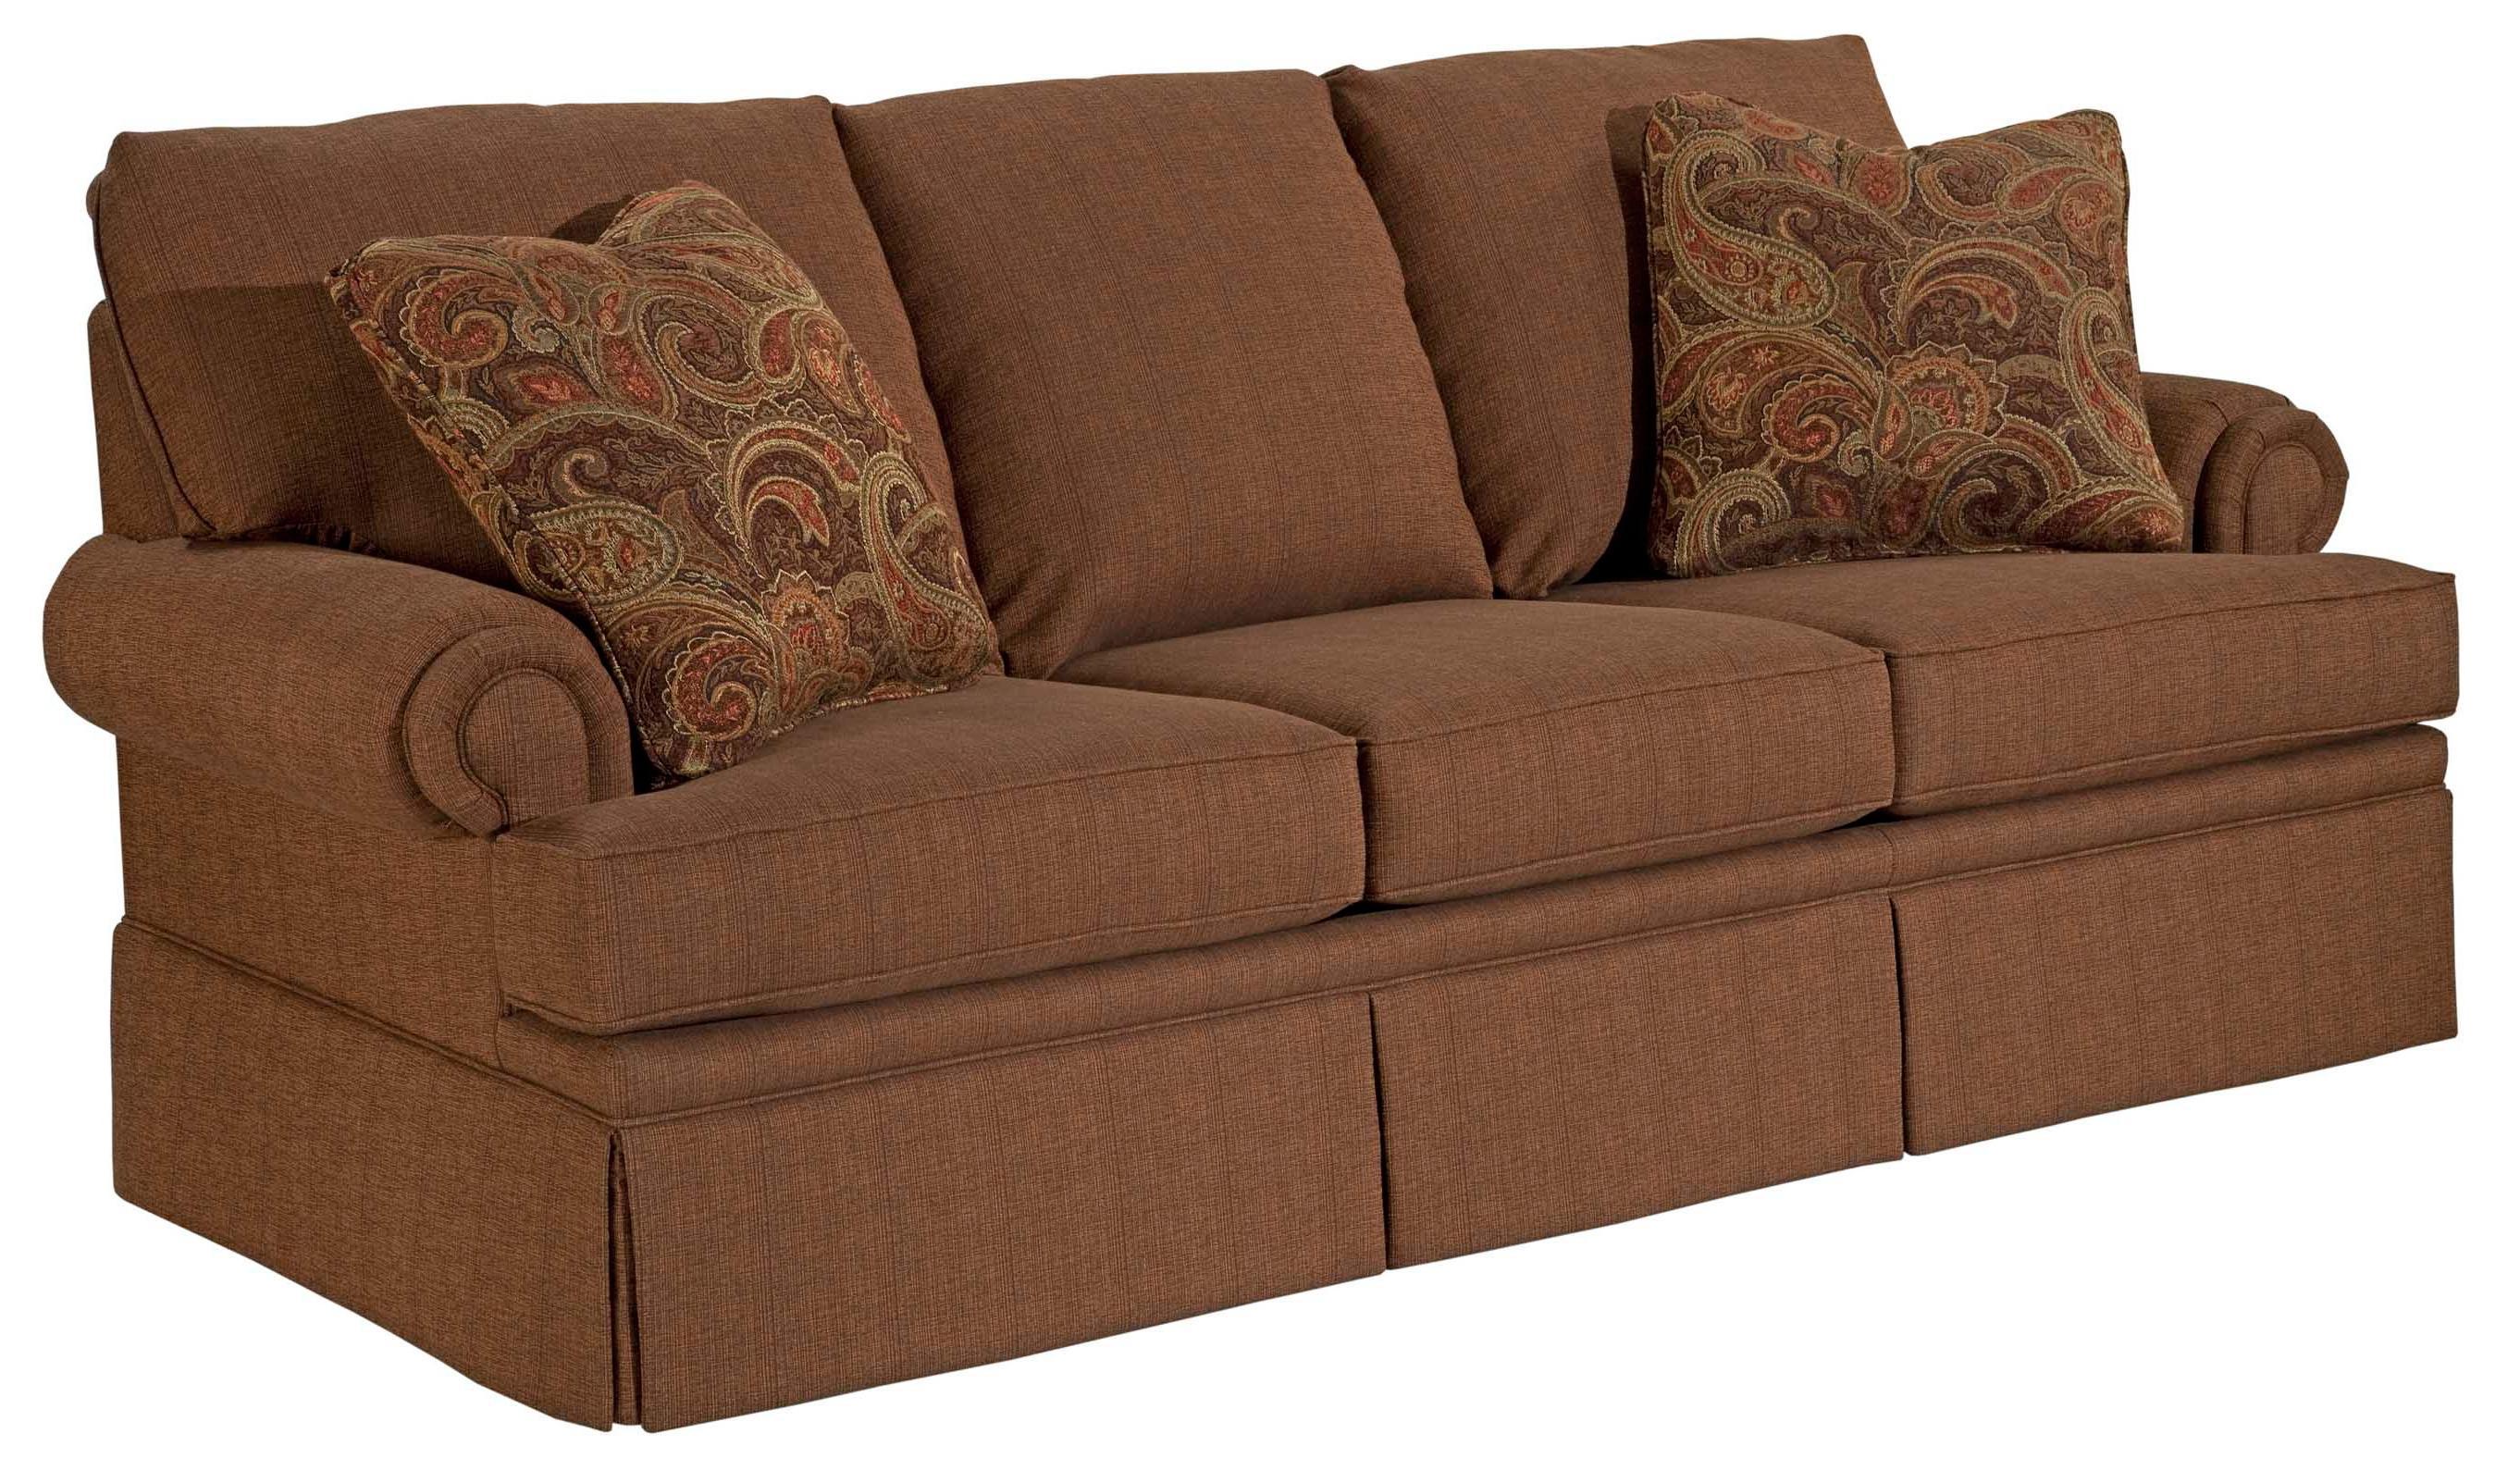 laramie sofa reviews bisectional broyhill sleeper fabulous